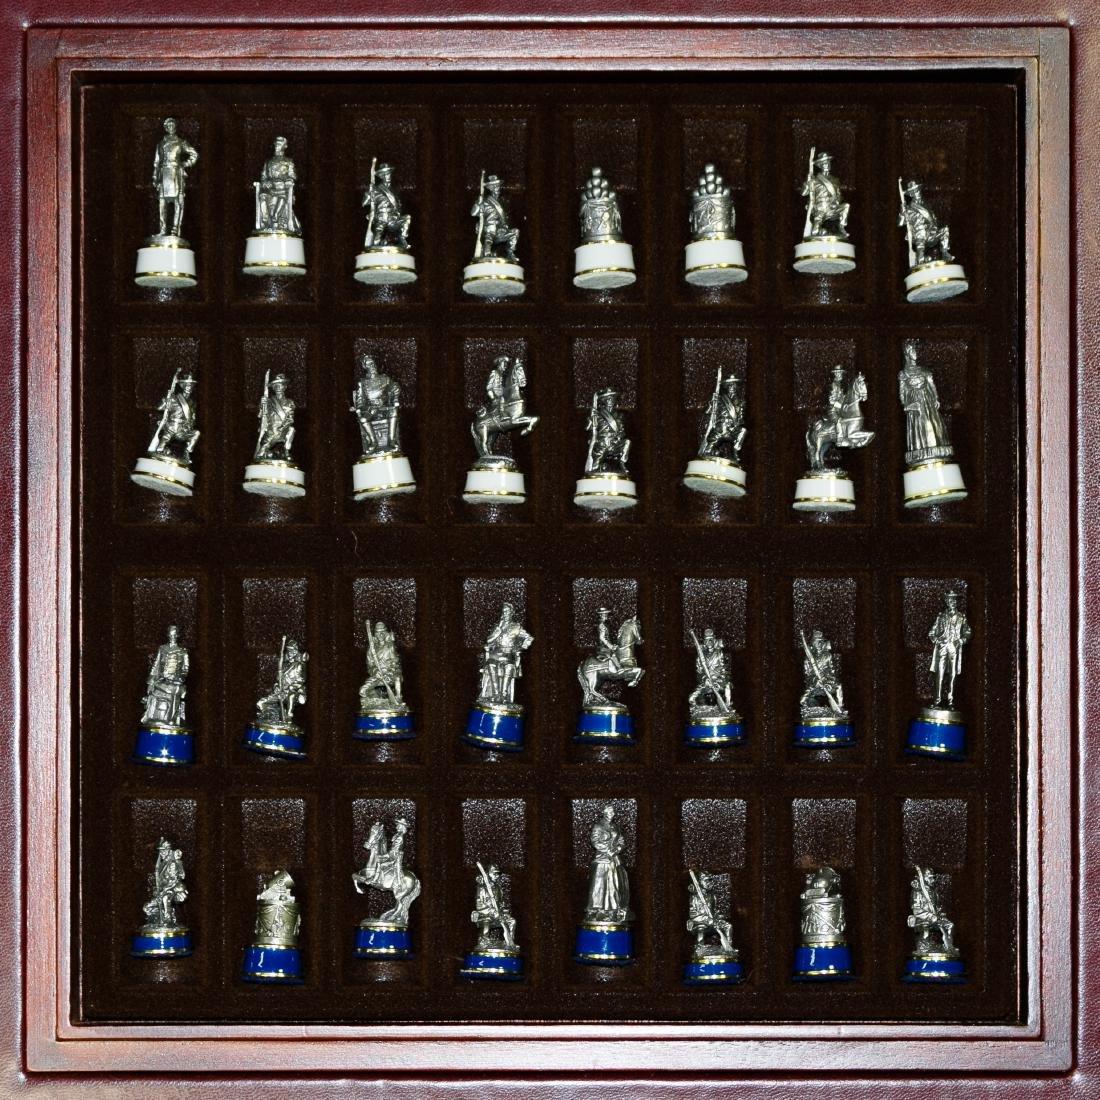 Franklin Mint 'Civil War' Chess Set on Table - 4